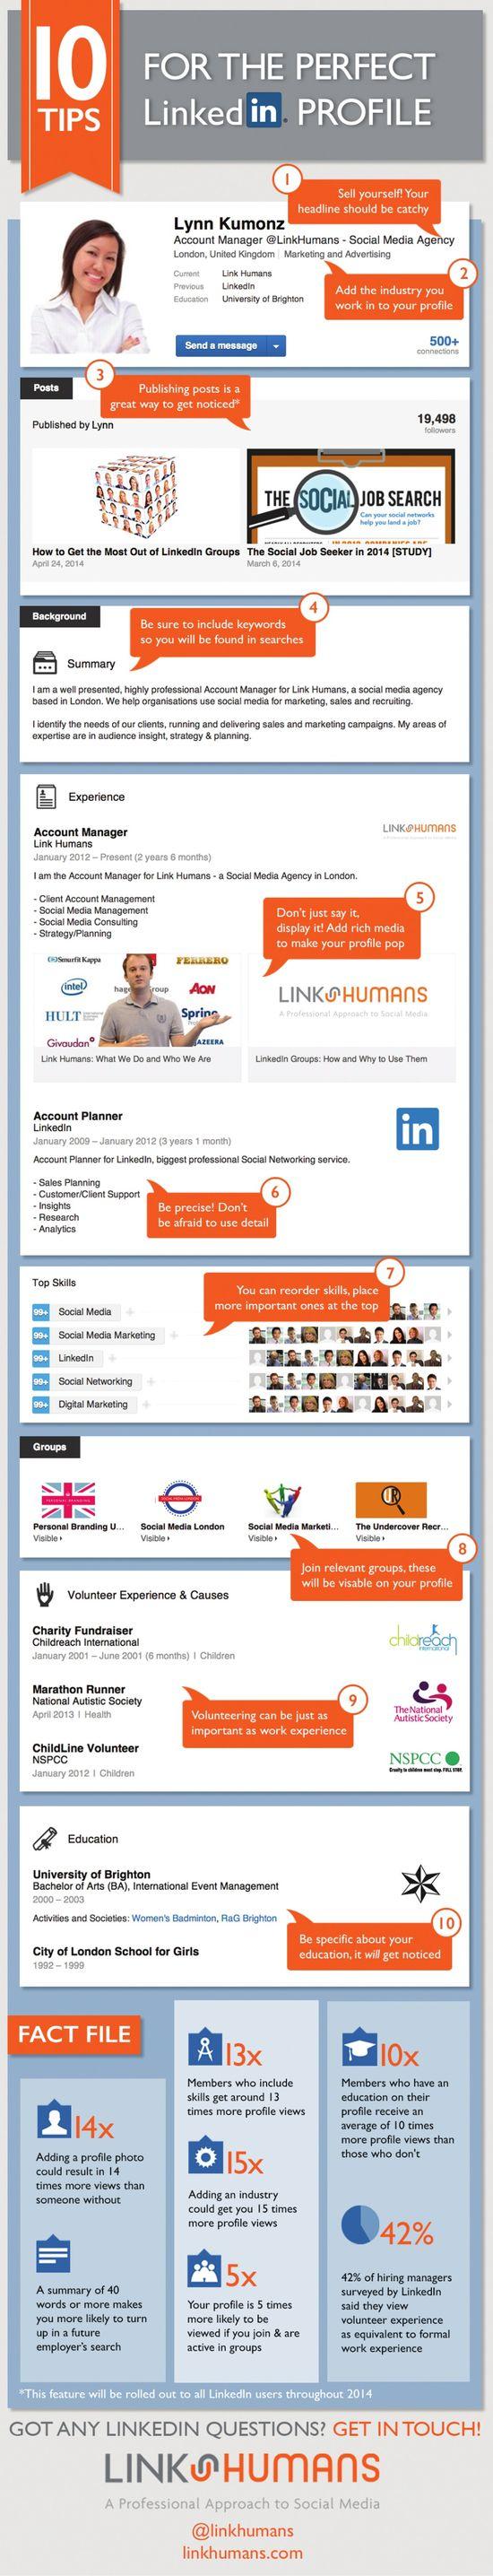 1 profil LinkedIn pa